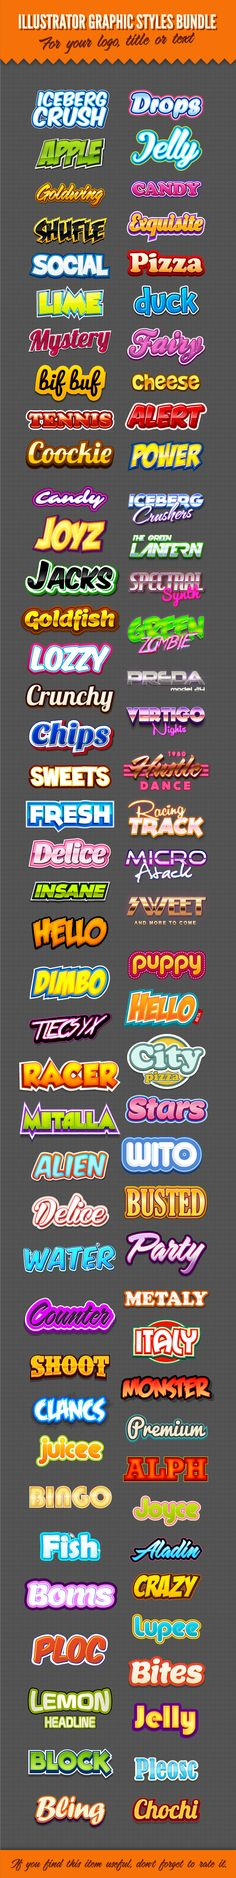 Illustrator Logo Graphic Styles Bundle 1 - Styles Illustrator